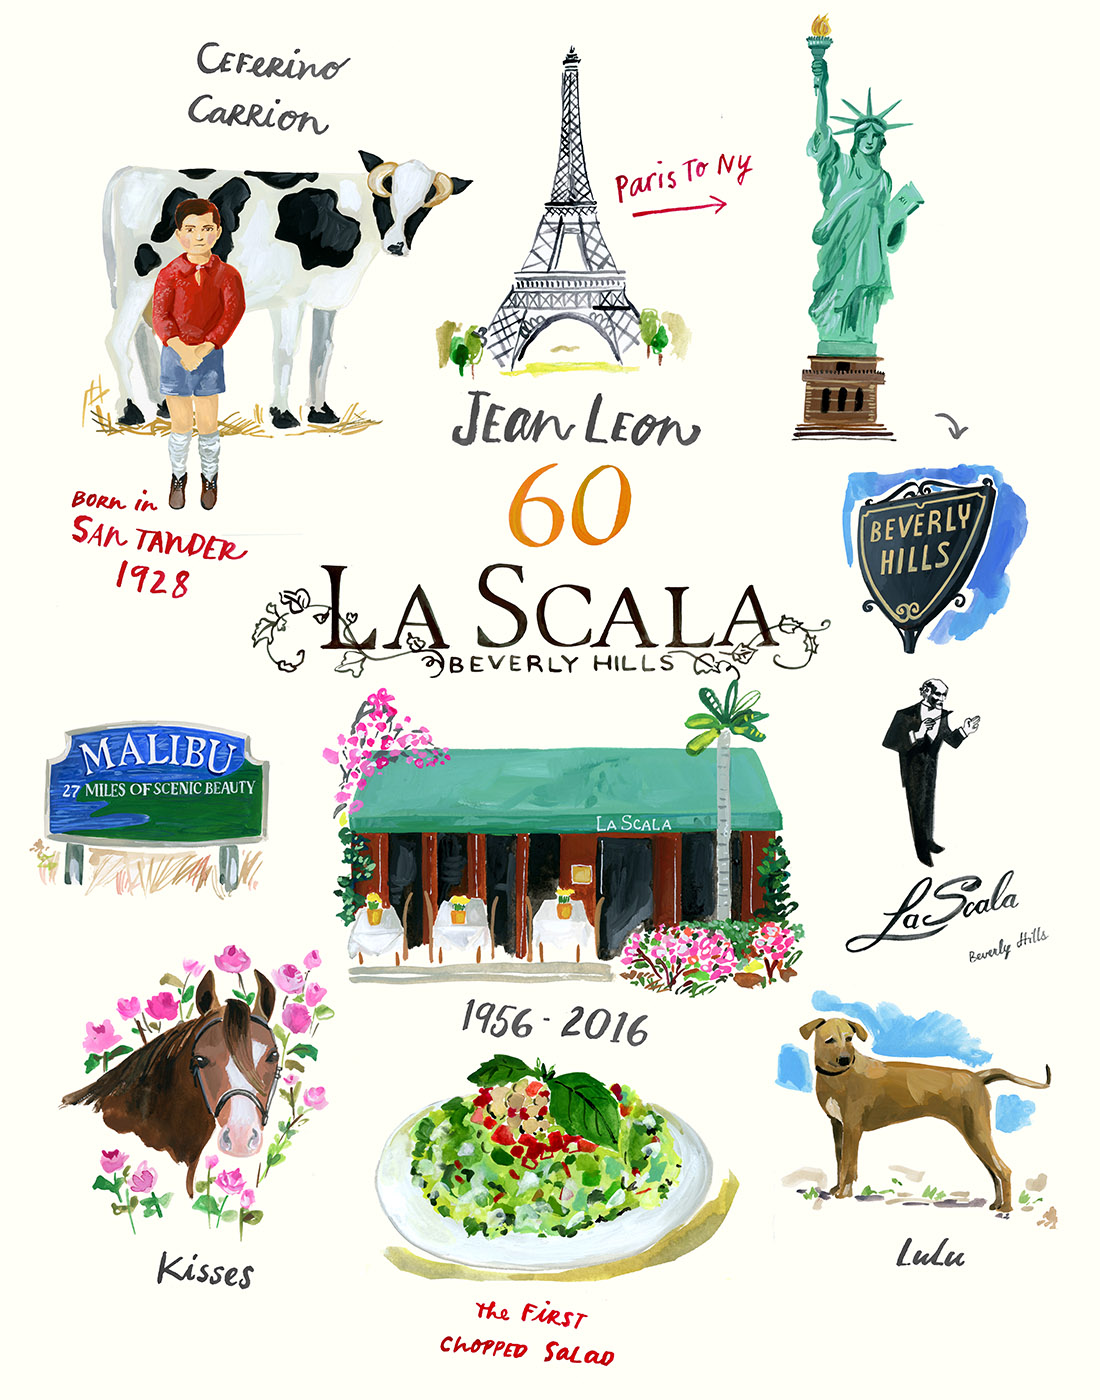 LaScala_timeline.jpg